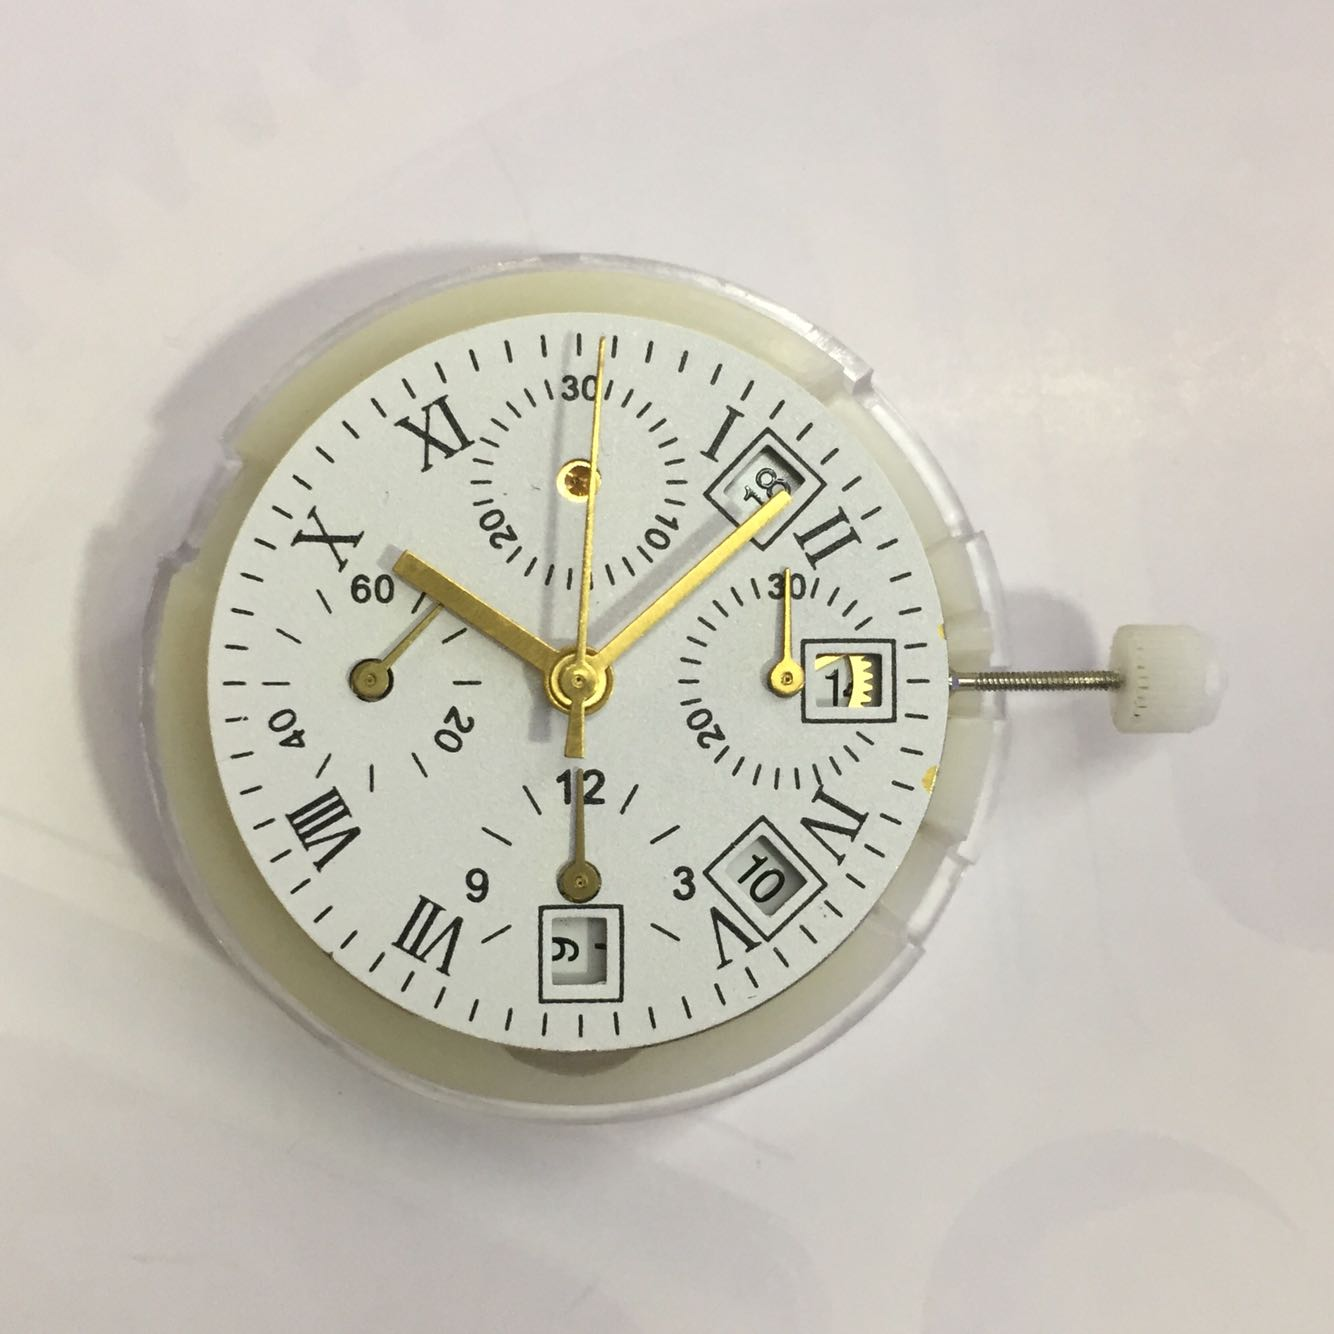 7750 Movement China Shangha 7750 Chronograph 3.6.9 Single Calendar